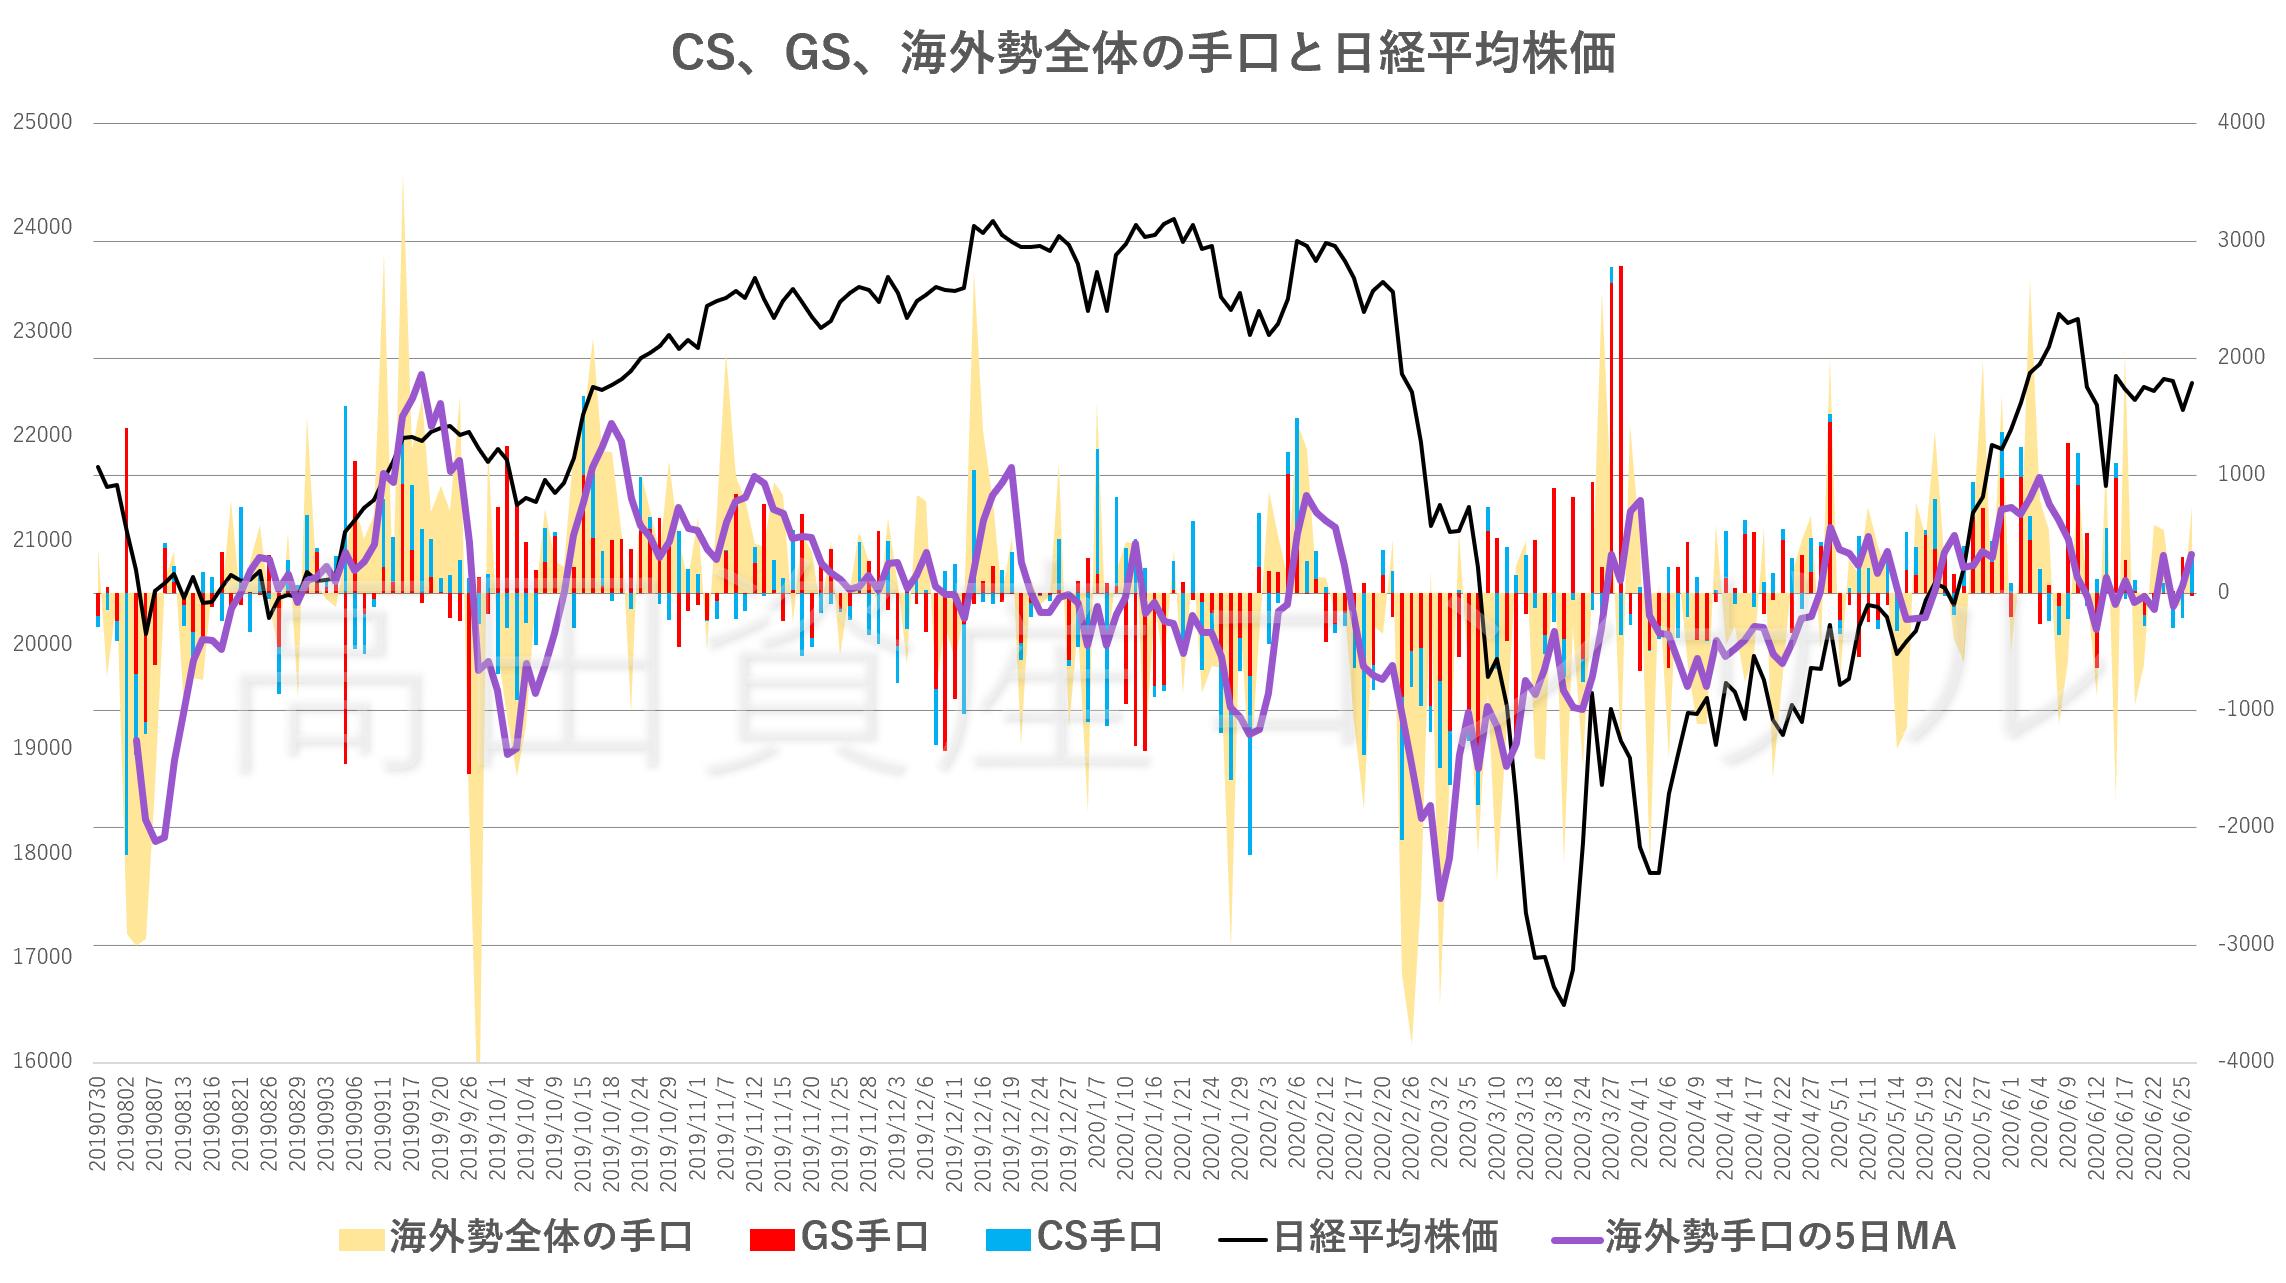 CS、GS、海外勢全体の手口と日経平均株価20200626